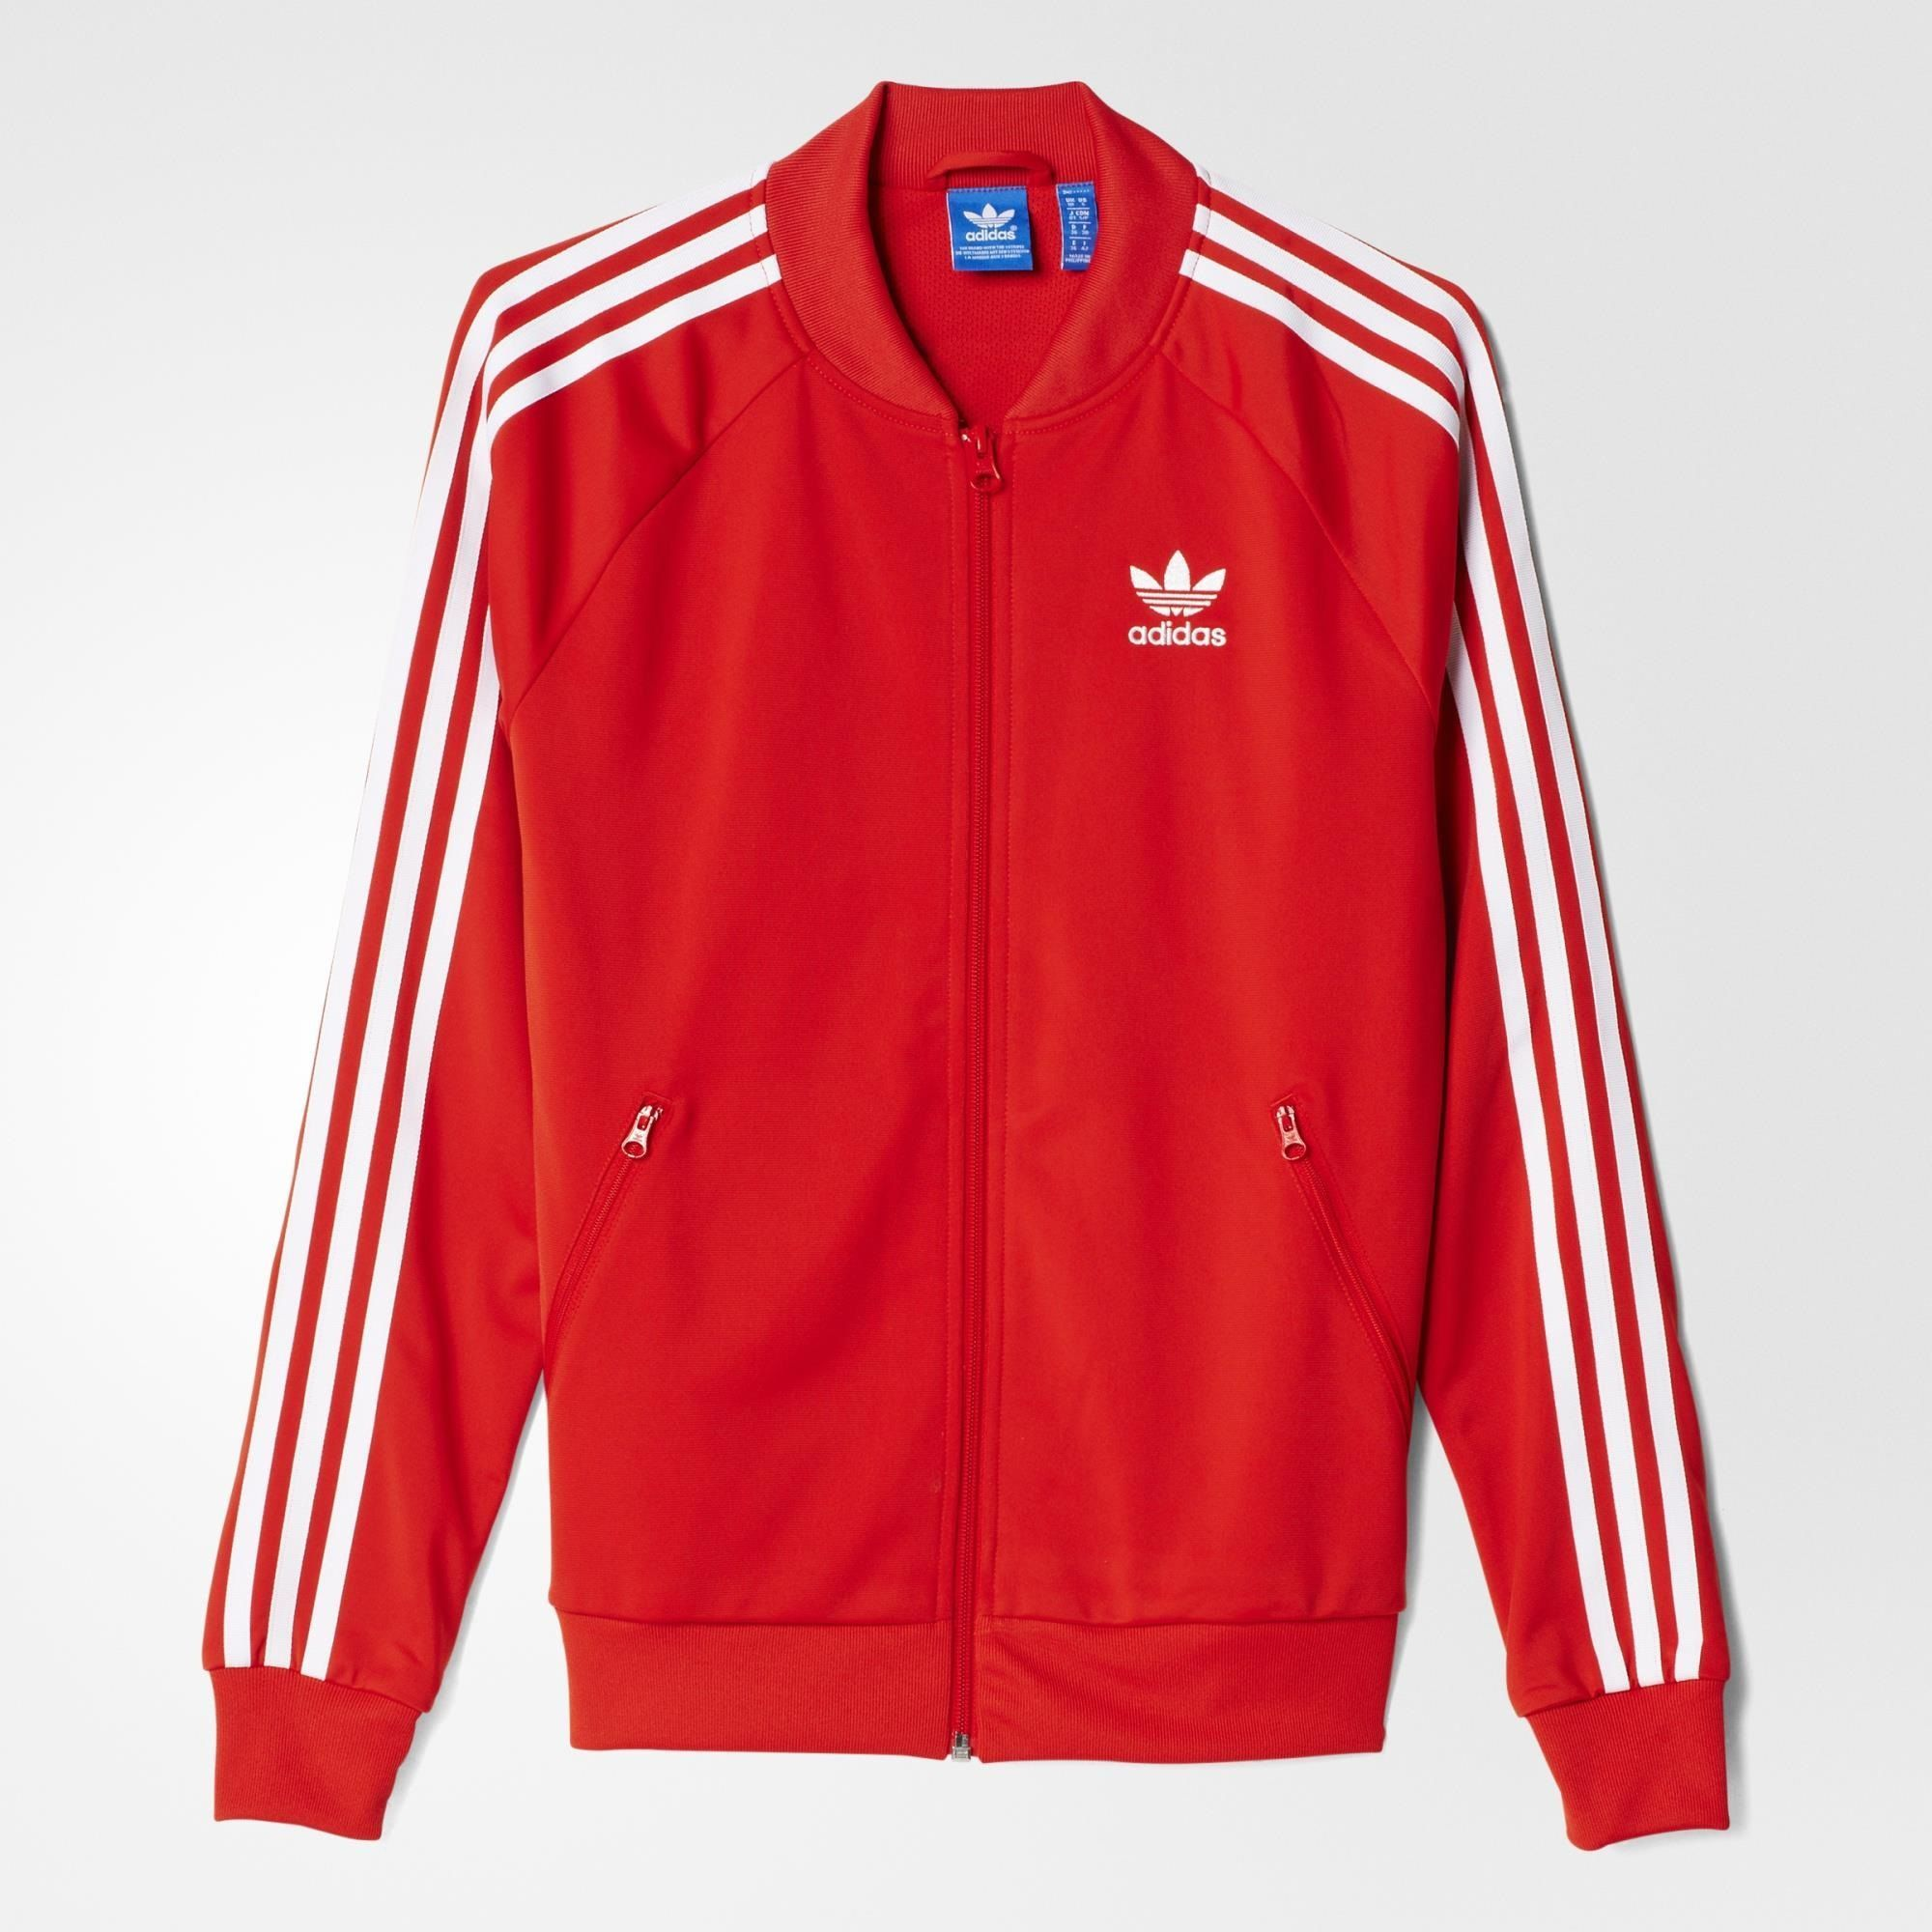 5948bea40a3 adidas Supergirl Track Jacket - Lush Red S16-St | adidas Belgium ...